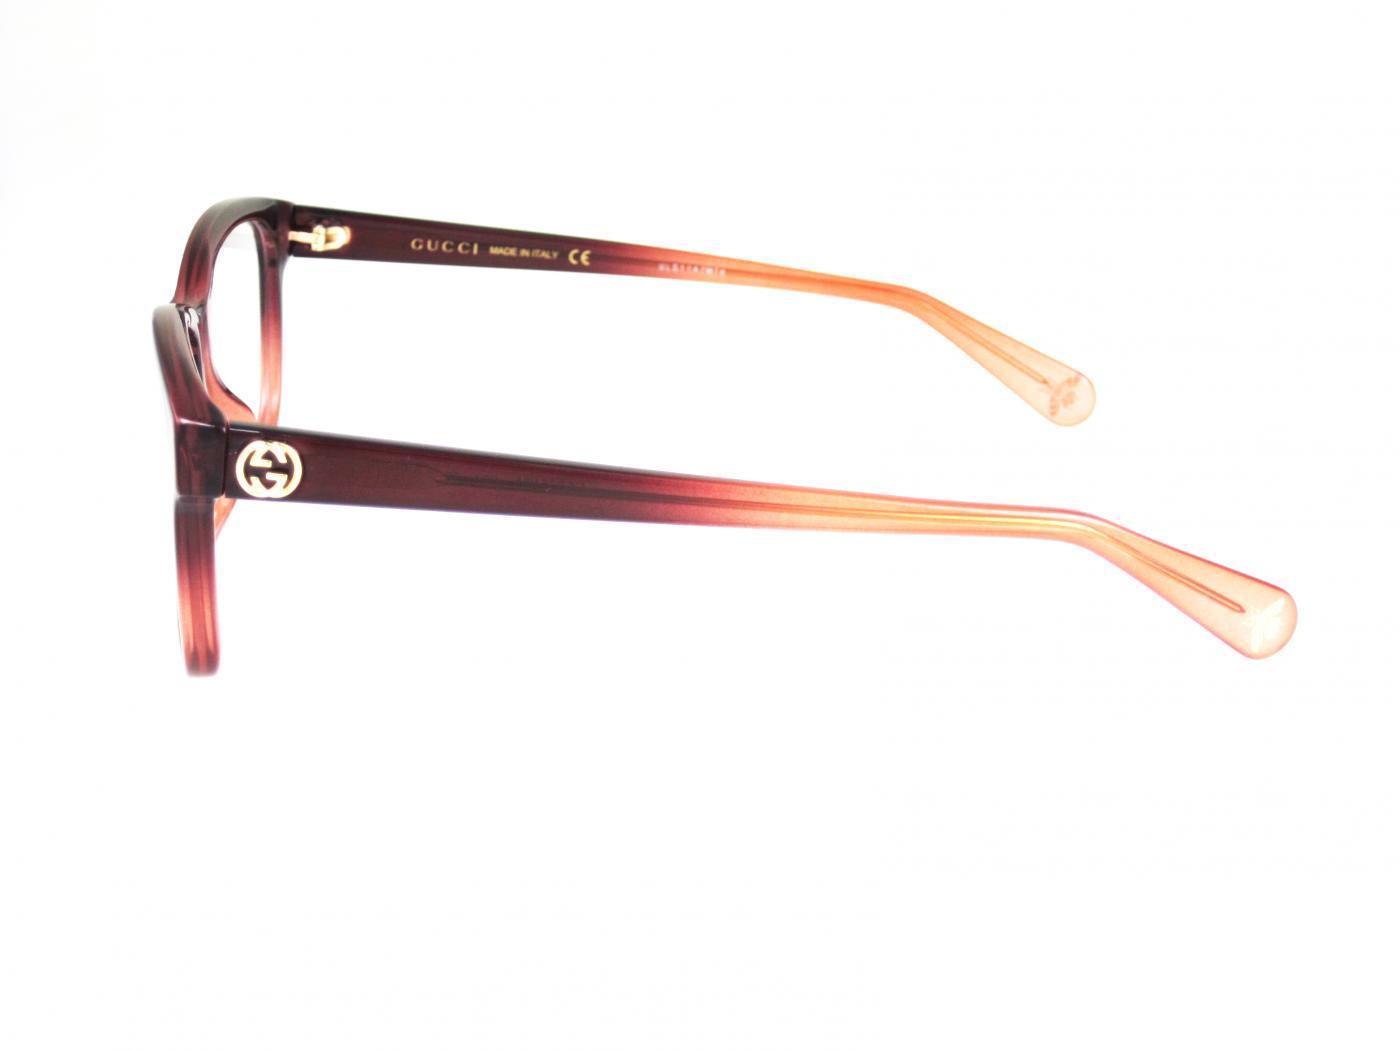 Dámske dioptrické okuliare Gucci  db3b917ee81